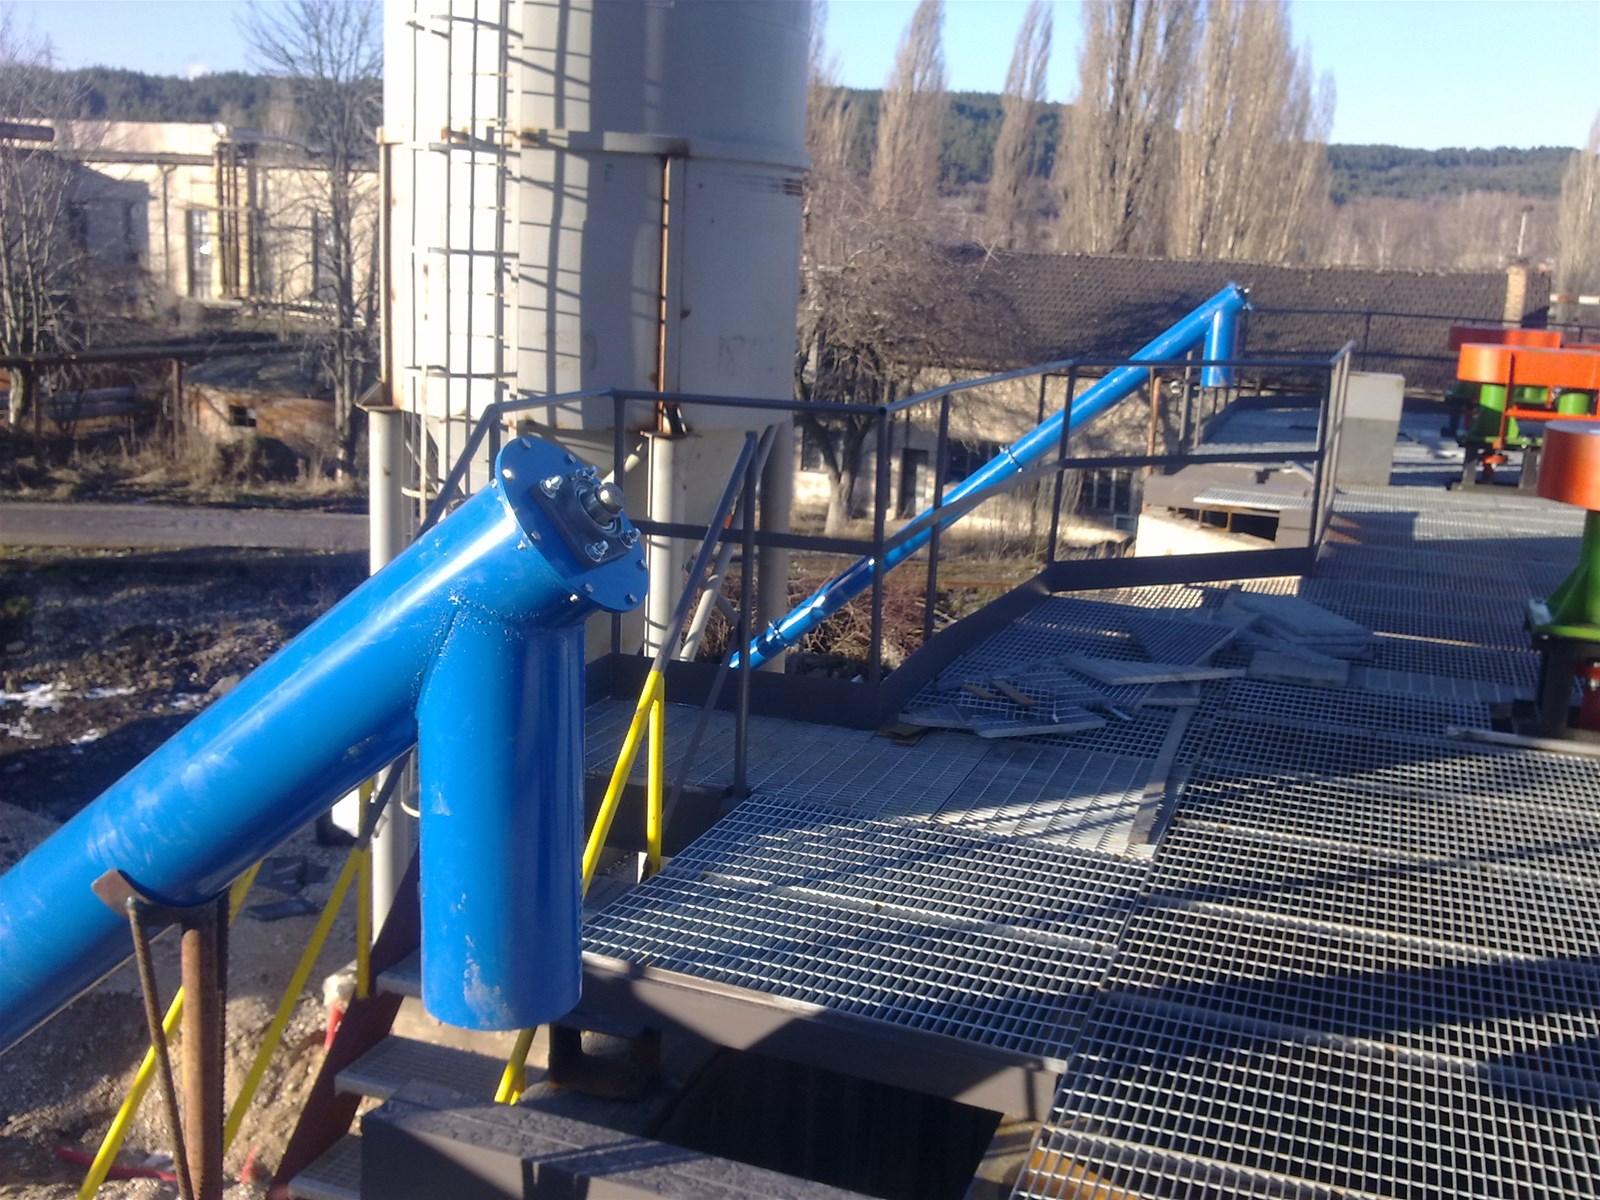 Screw Conveyor Steel Auger for Grain, Powder, Dry Sawdust, Cement - 6 m,  5,5 KW